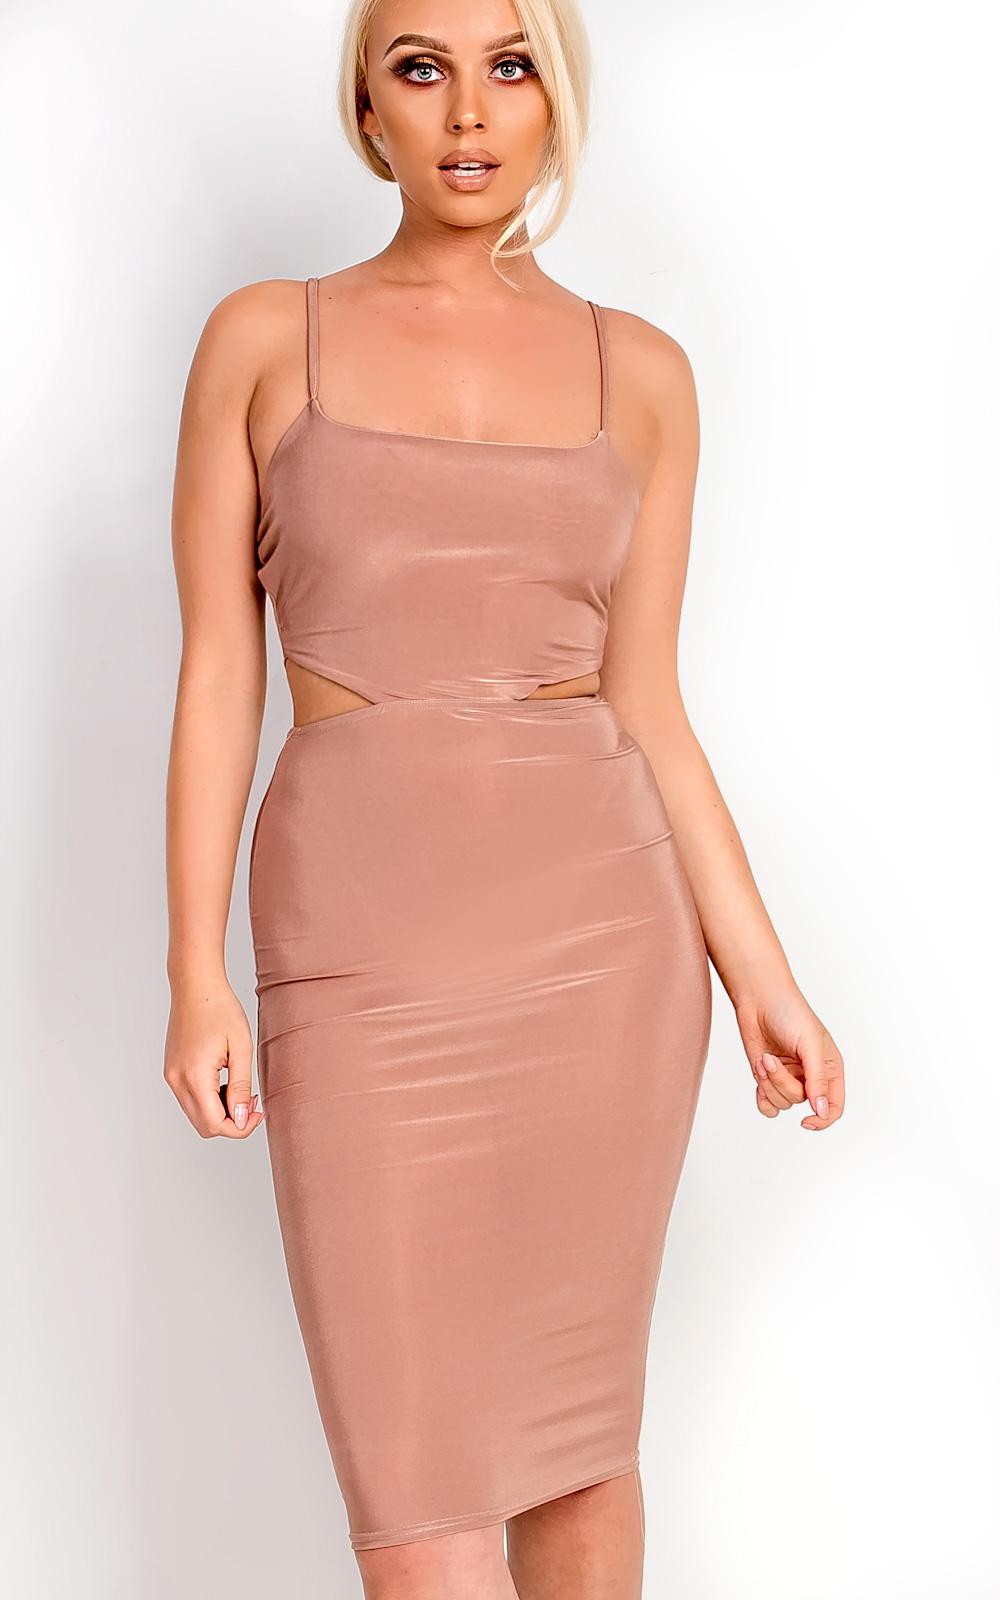 IKRUSH-Womens-Ajtar-Slinky-Cut-out-Dress